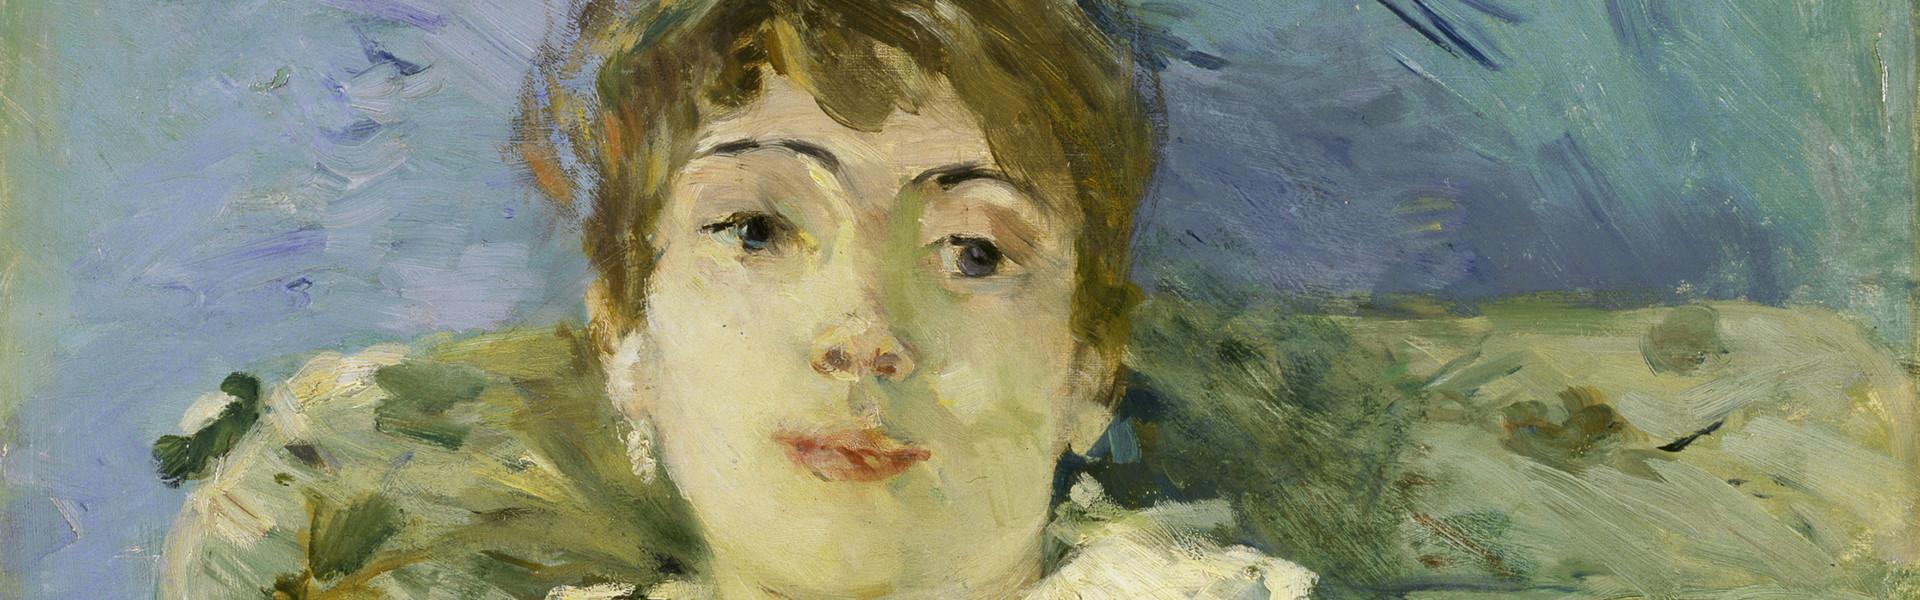 Berthe Morisot, Junge Frau auf dem Sofa (Jeune Femme Au Divan), Detail, 1885 Öl auf Leinwand, 61 x 50.2 cm, Tate, London; Bequeathed by the Hon. Mrs A.E. Pleydell-Bouverie, through the Friends of the Tate Gallery 1968, Photo © Tate